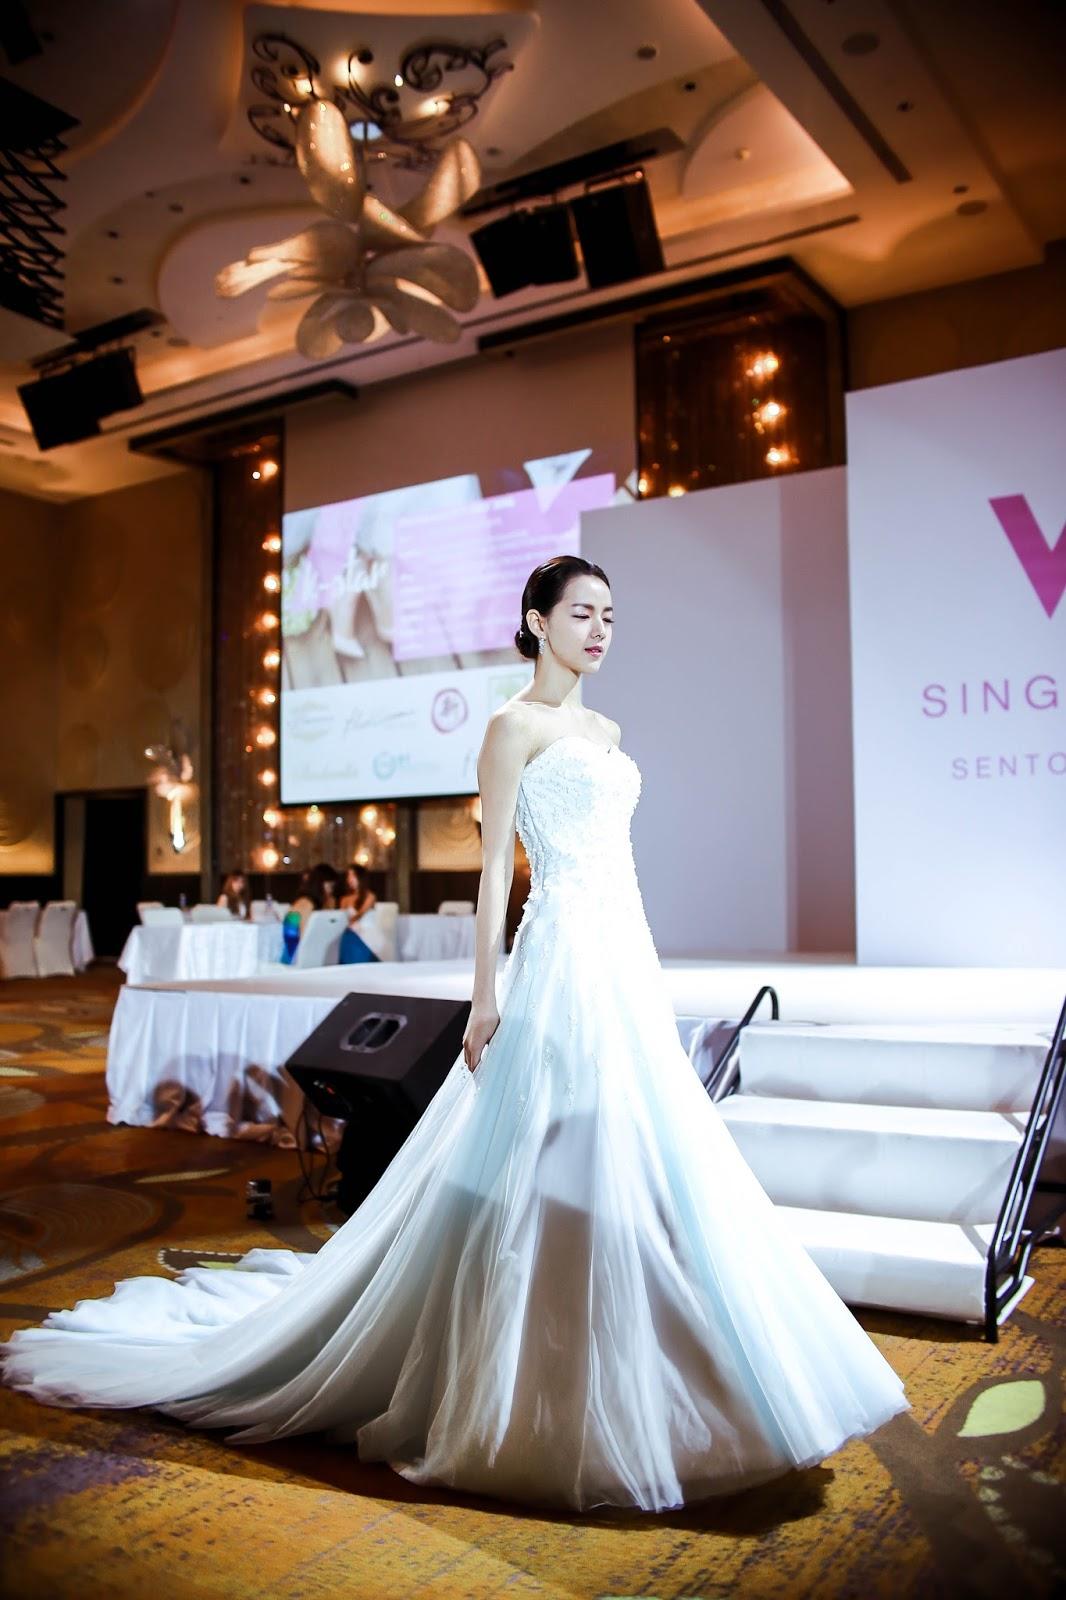 Korean Style Wedding Dress 81 Nice Every model on stage